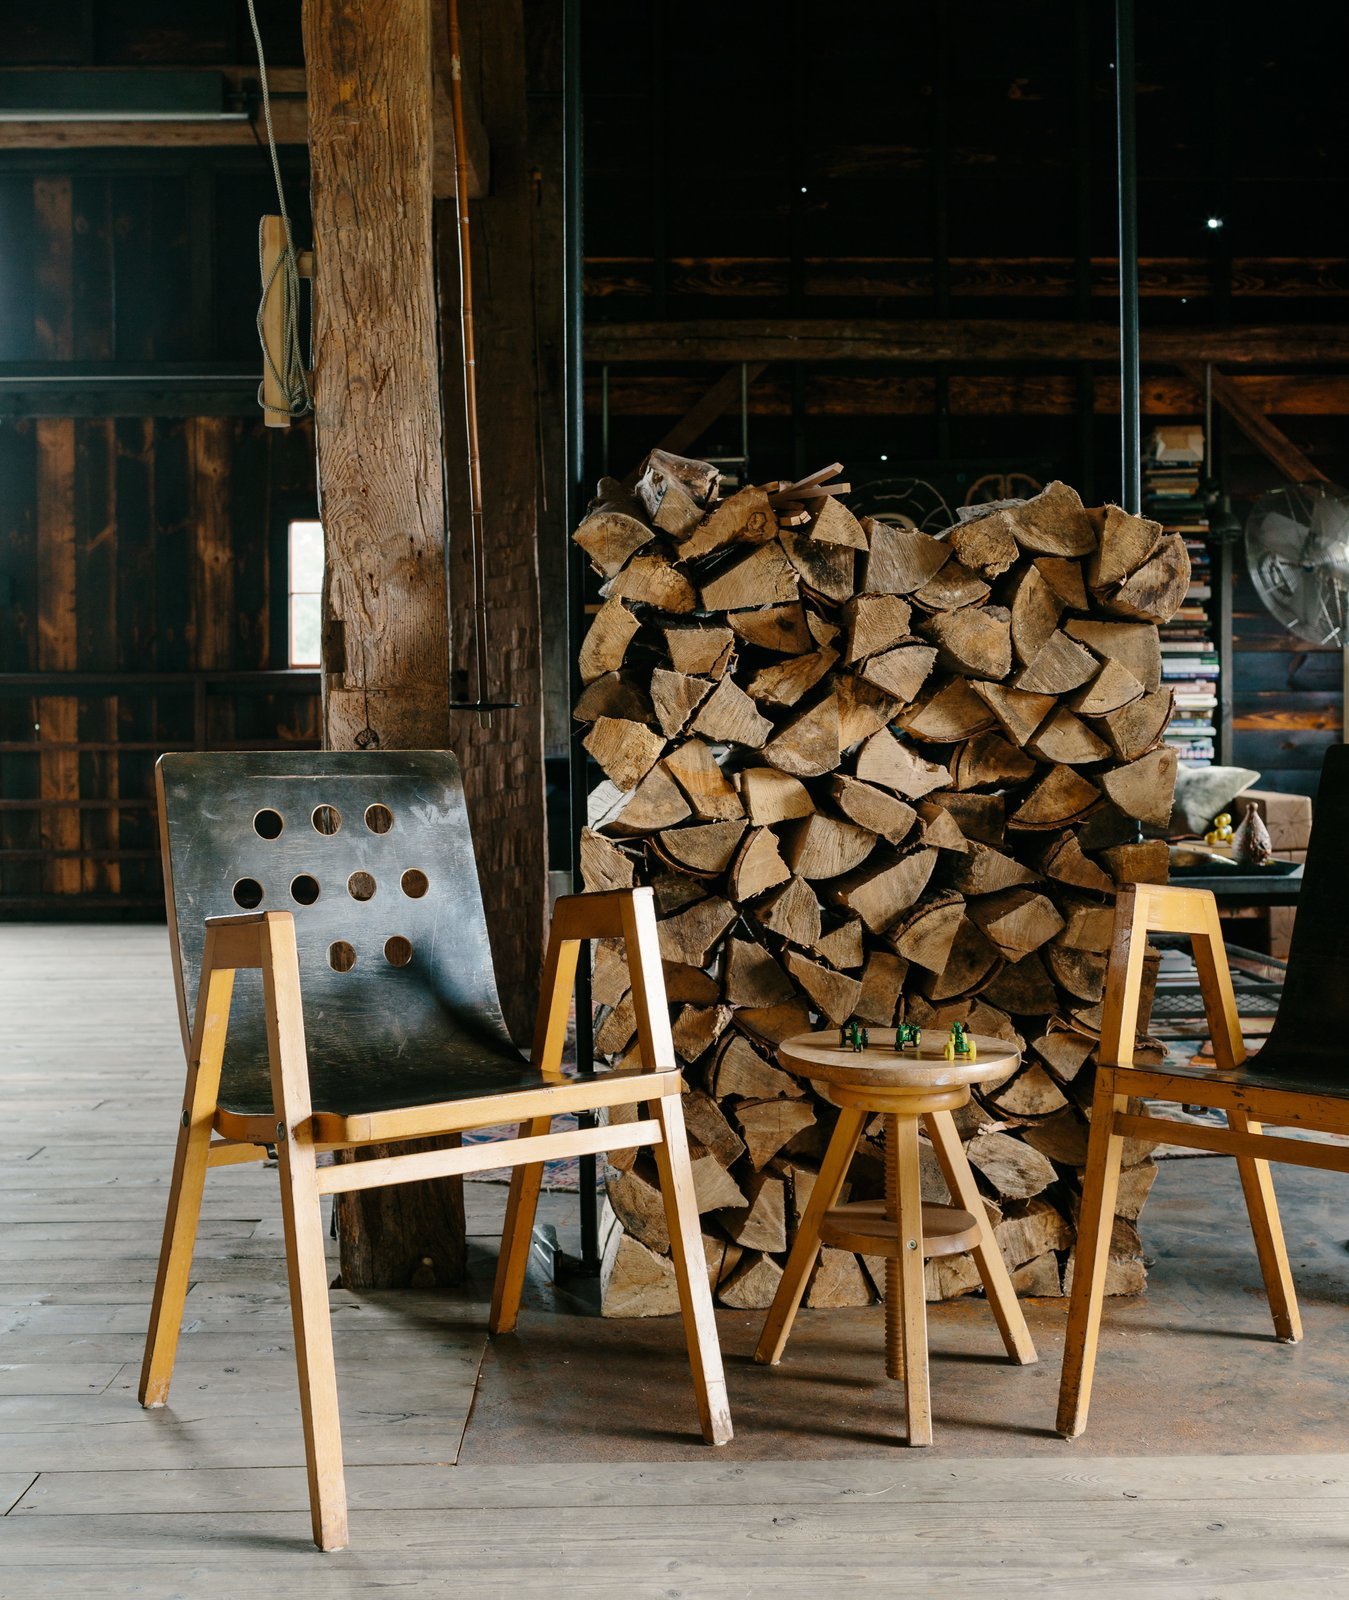 #seatingdesign #seating #chairs #wood #interior #inside #barn #BarlisWedlick #HudsonValley #NewYork #vintage #plywood #RolandRainer  100+ Best Modern Seating Designs